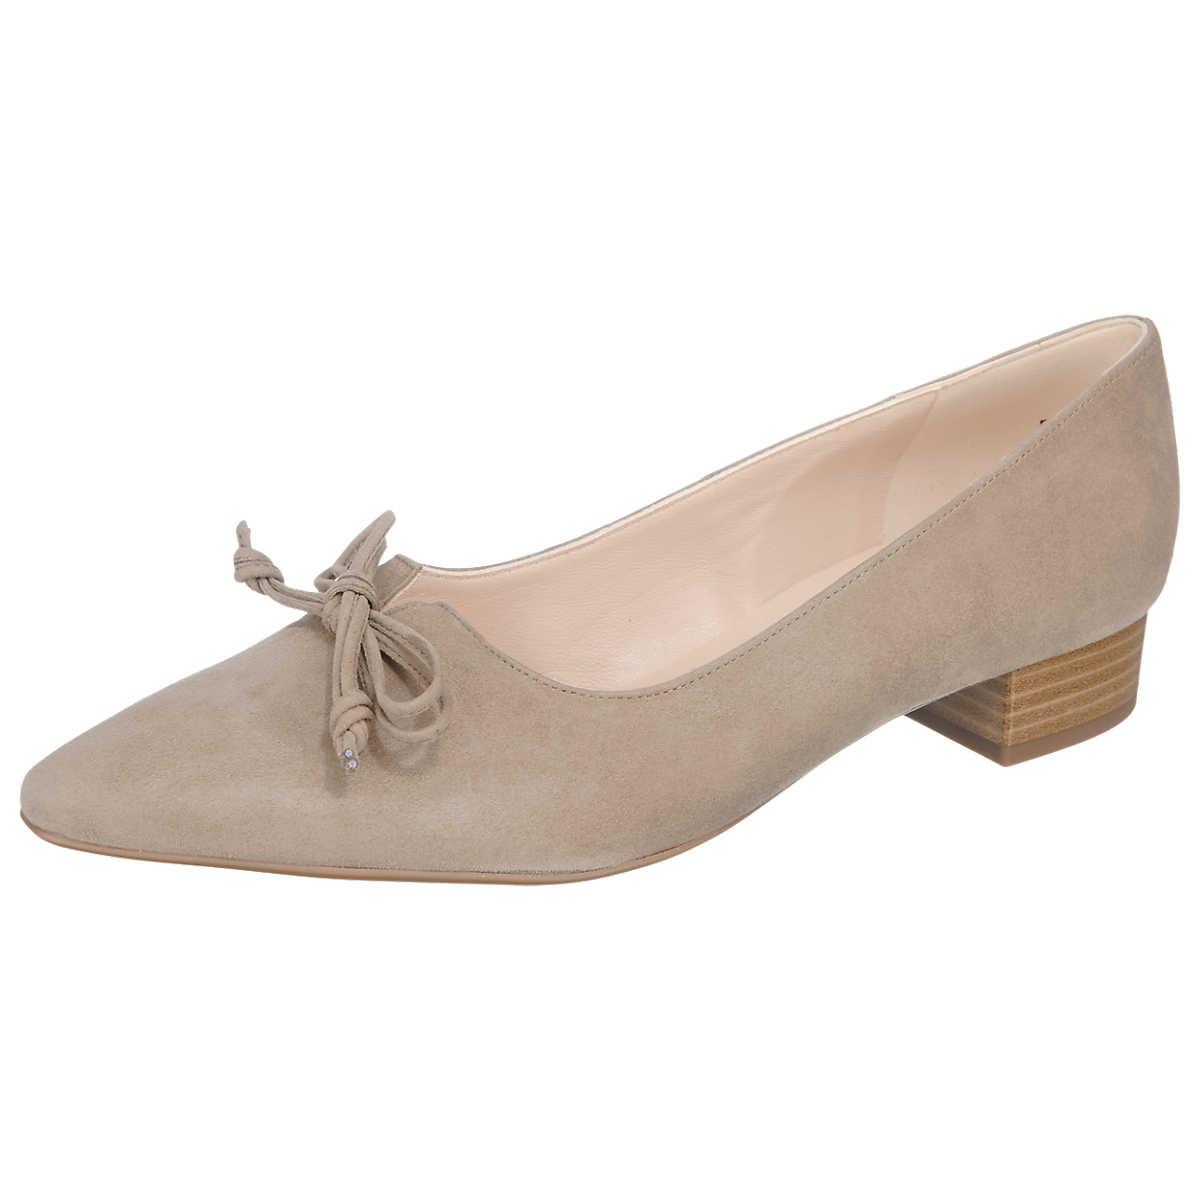 PETER KAISER Lizzy Ballerinas beige - PETER KAISER - Ballerinas - Schuhe - mirapodo.de